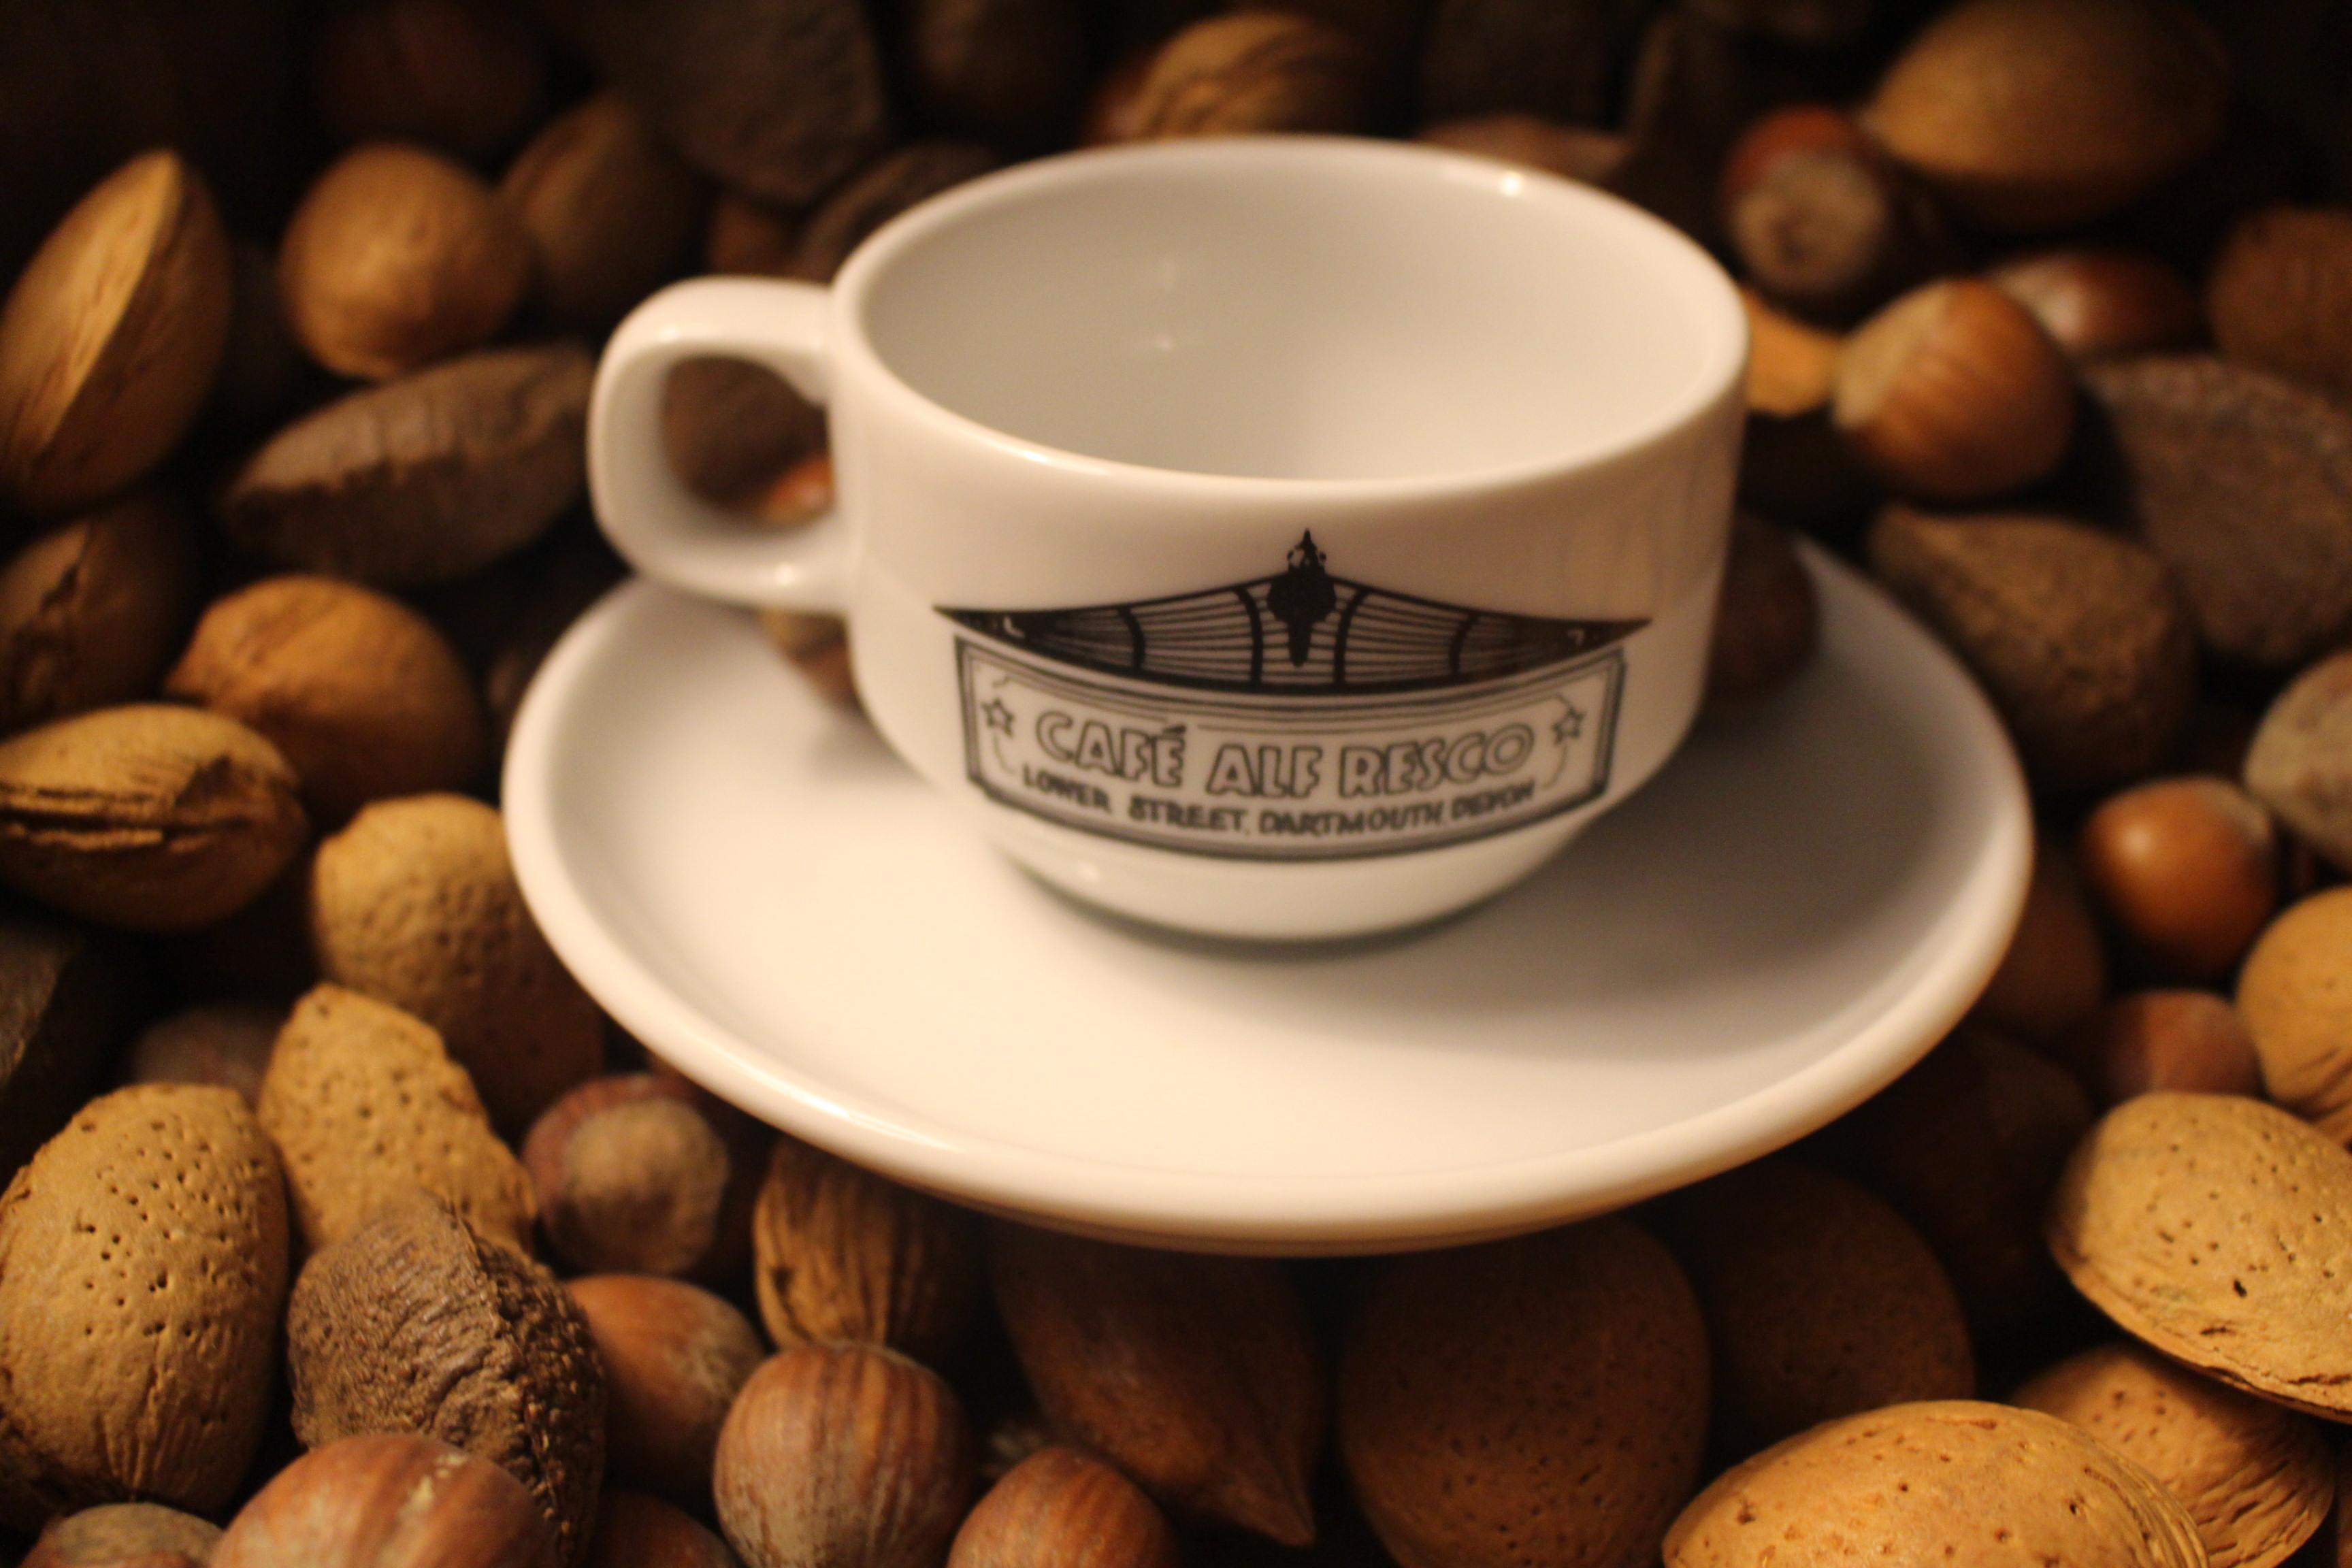 Alf's Cup & Saucer